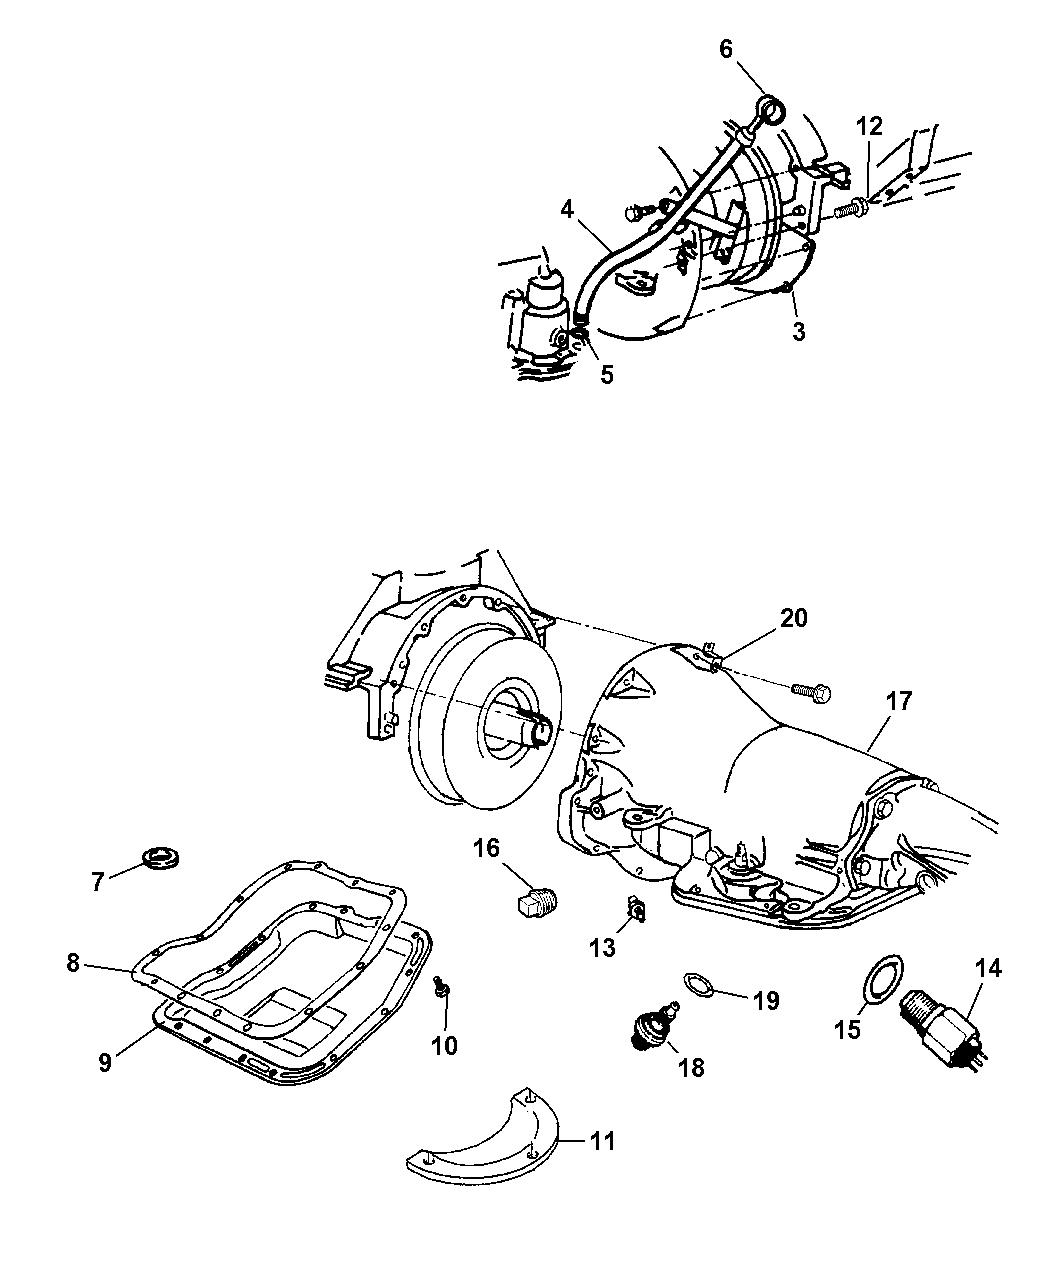 2005 Dodge Ram 1500 Case Related Parts Mopar Giant 48re Transmission Wiring Diagram Thumbnail 2